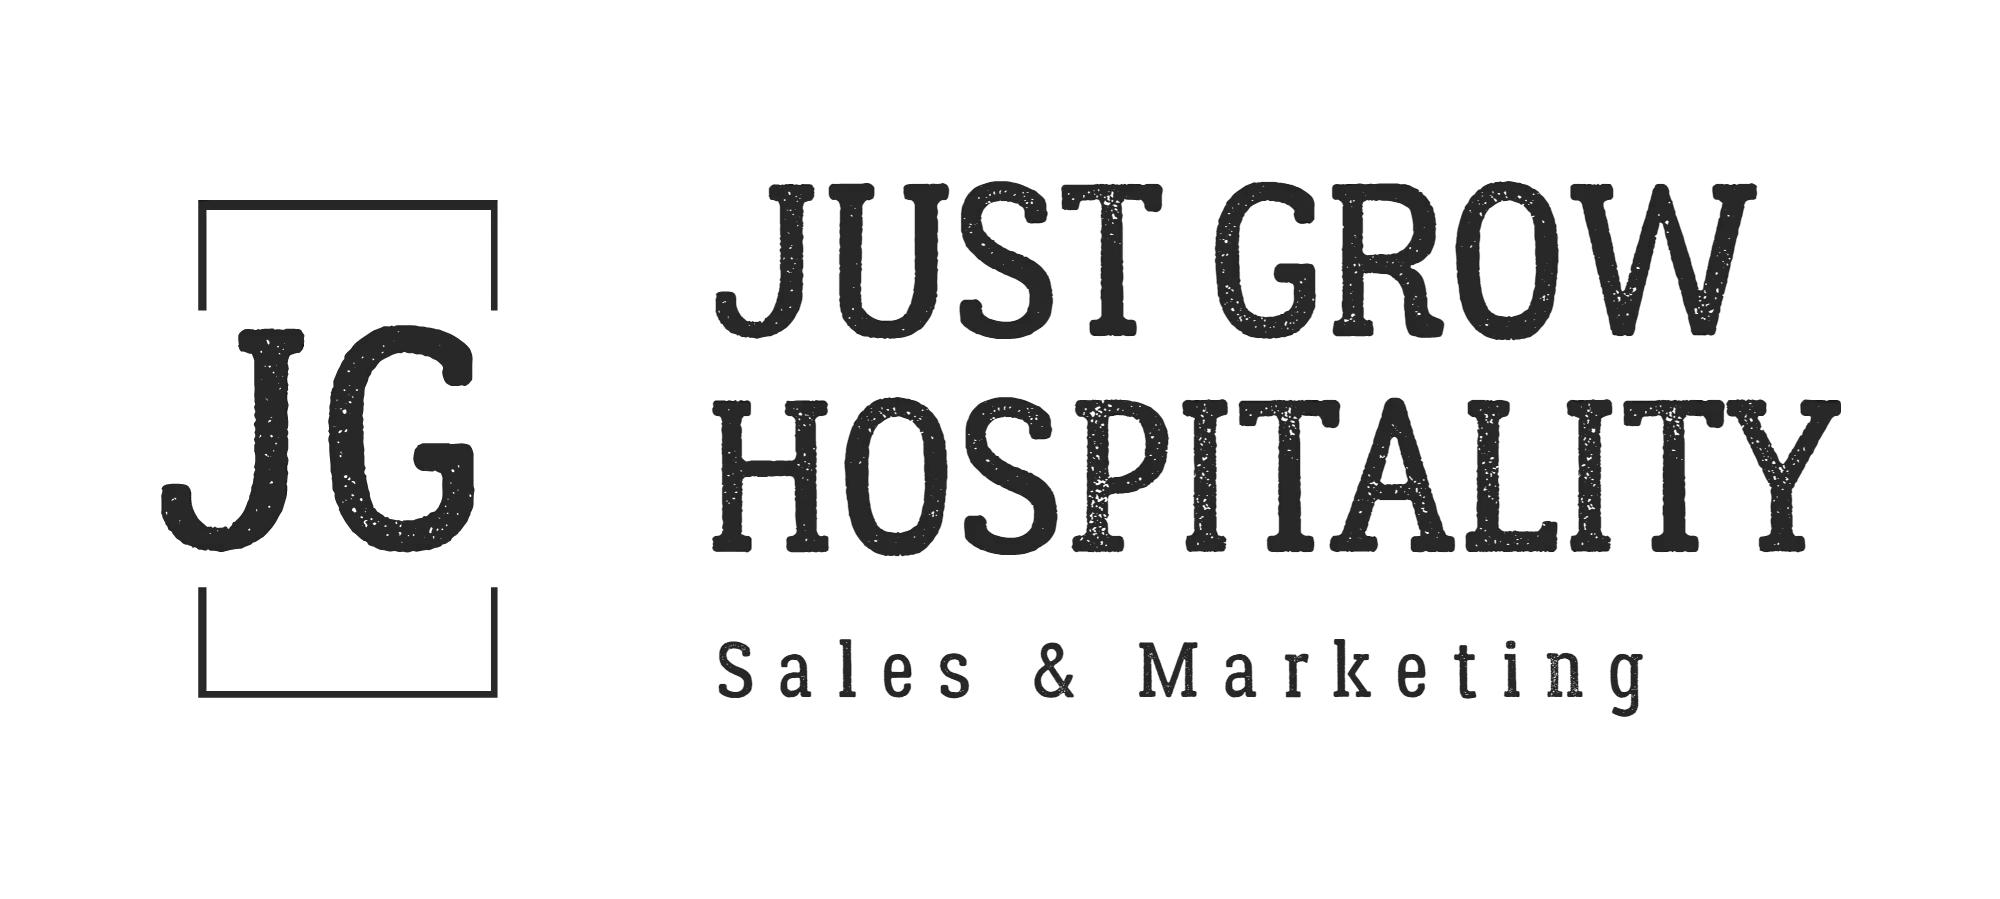 Just Grow Hospitality